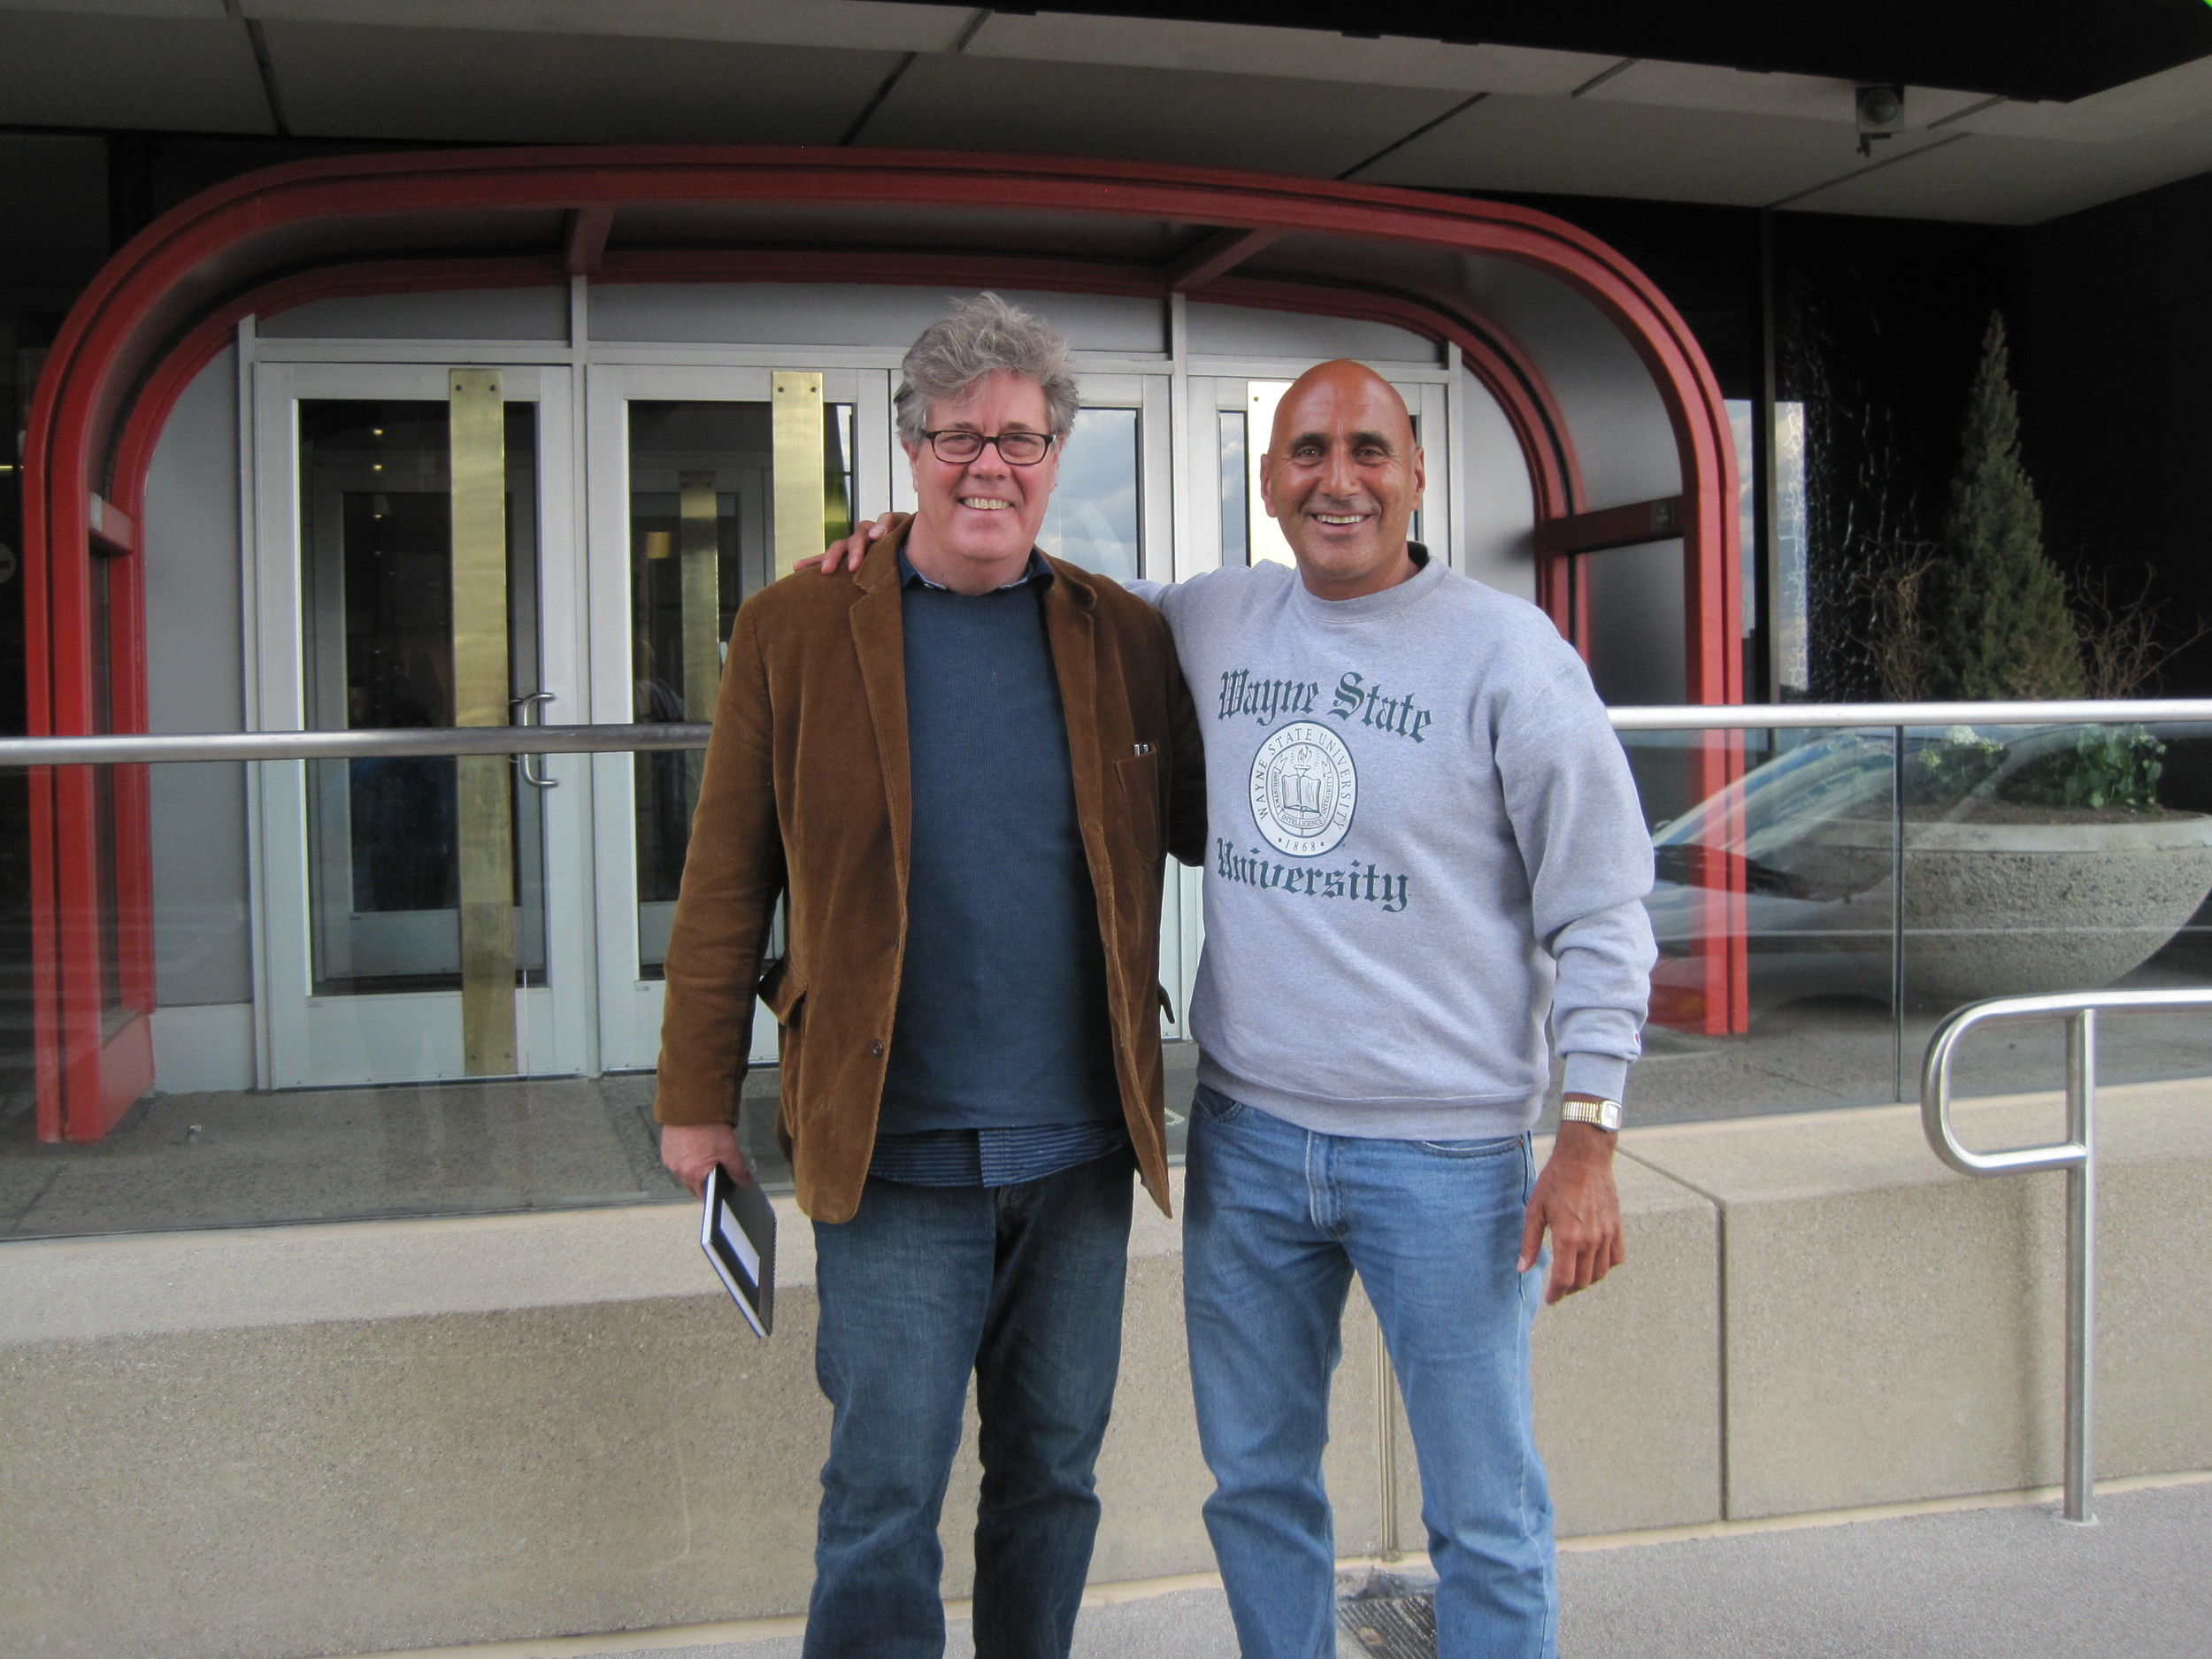 Saturday, May 3, 2014. David Maraniss and me at the Marriott Renaissance Center, Detroit